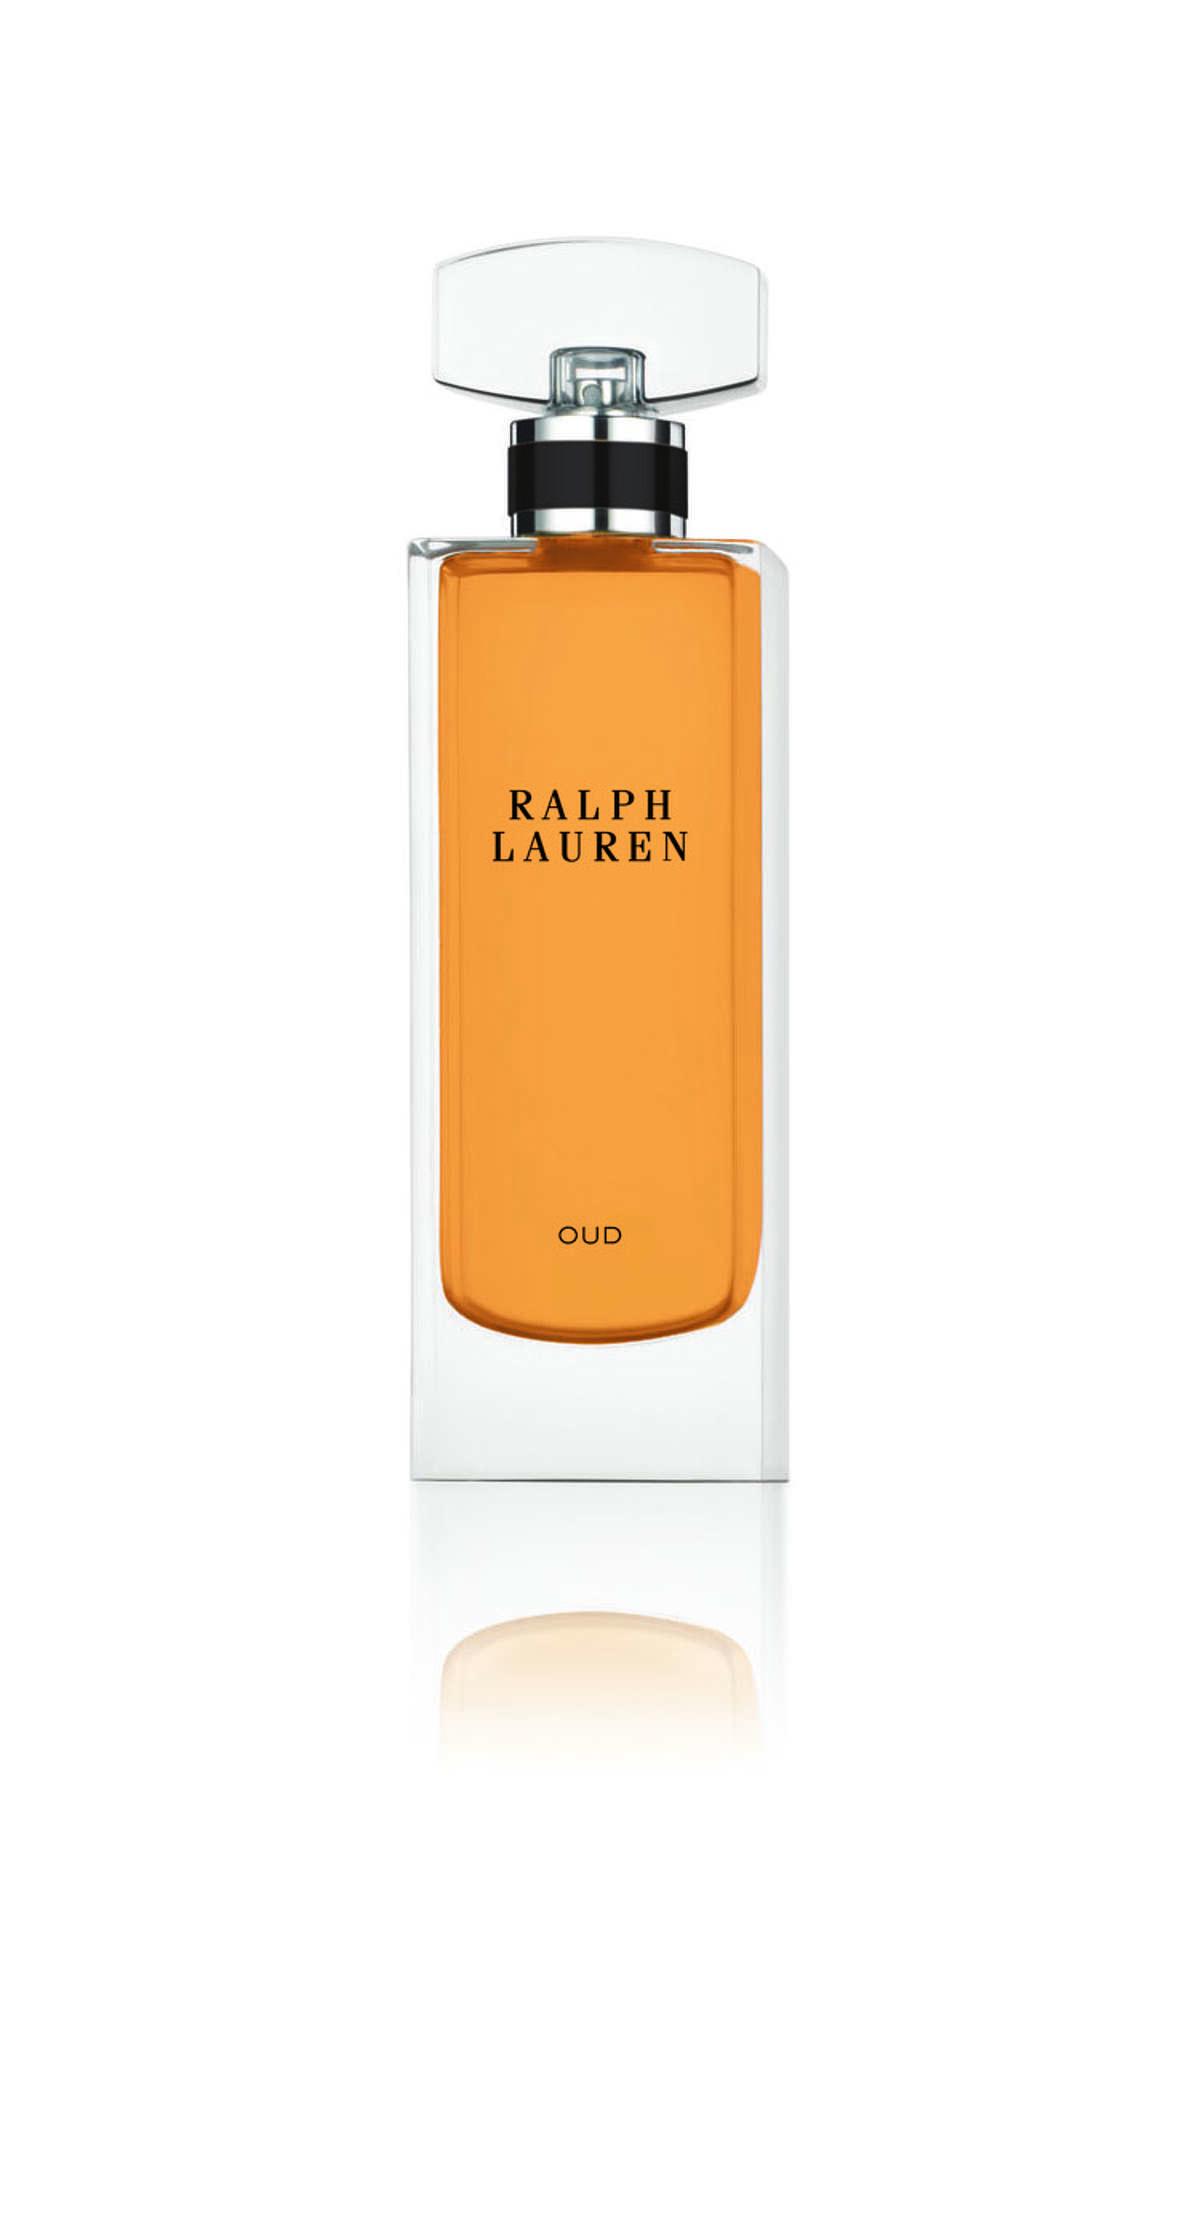 Ralph Lauren Oud evokes the spirit of the African savannah.